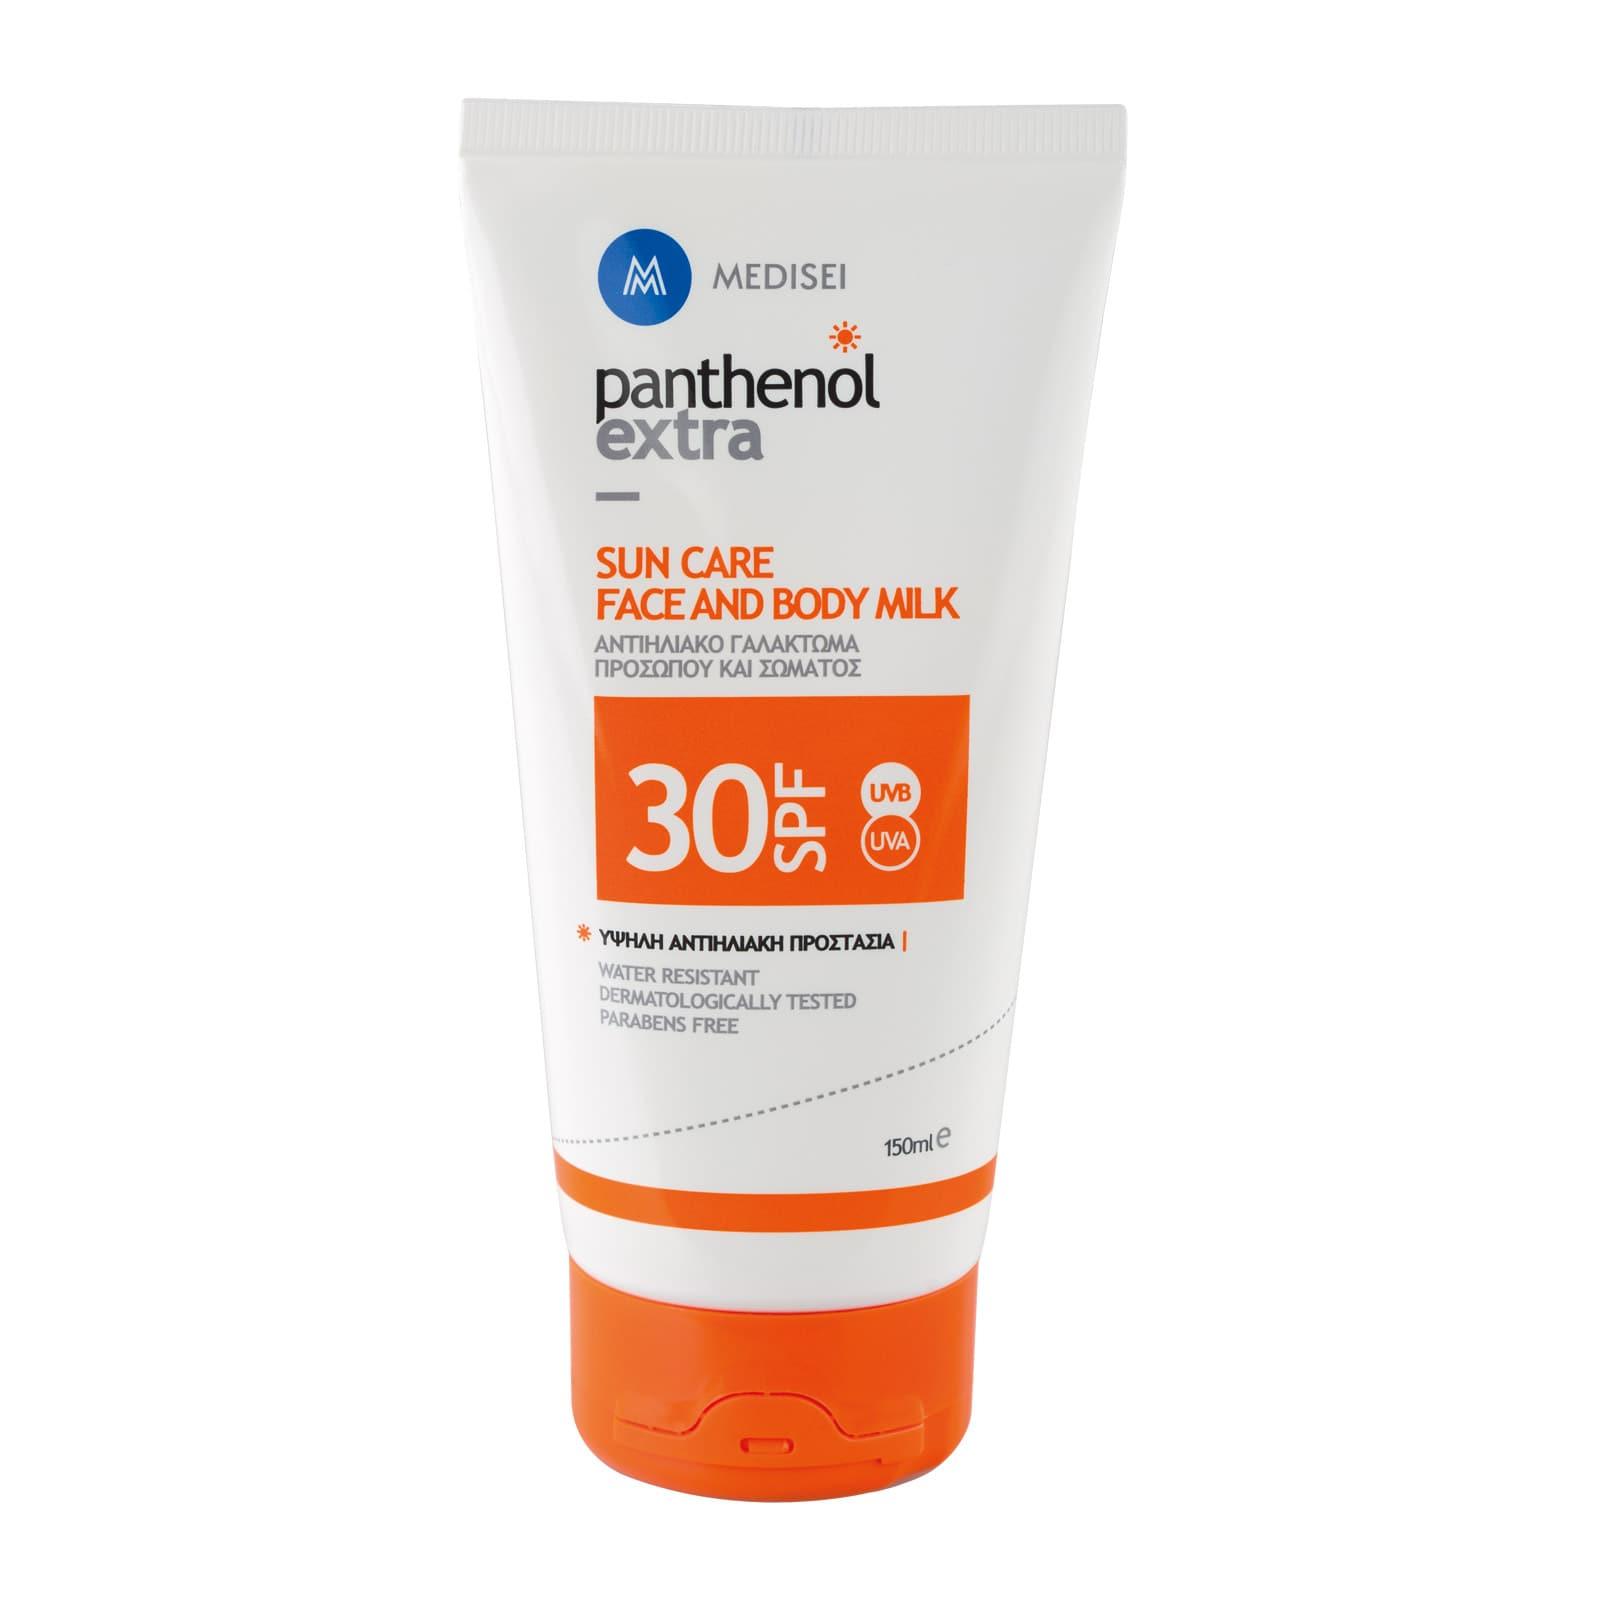 Panthenol Extra Sun Care Face & Body Milk SPF30 Αντιηλιακό Γαλάκτωμα για πρόσωπο & σώμα, 150ml